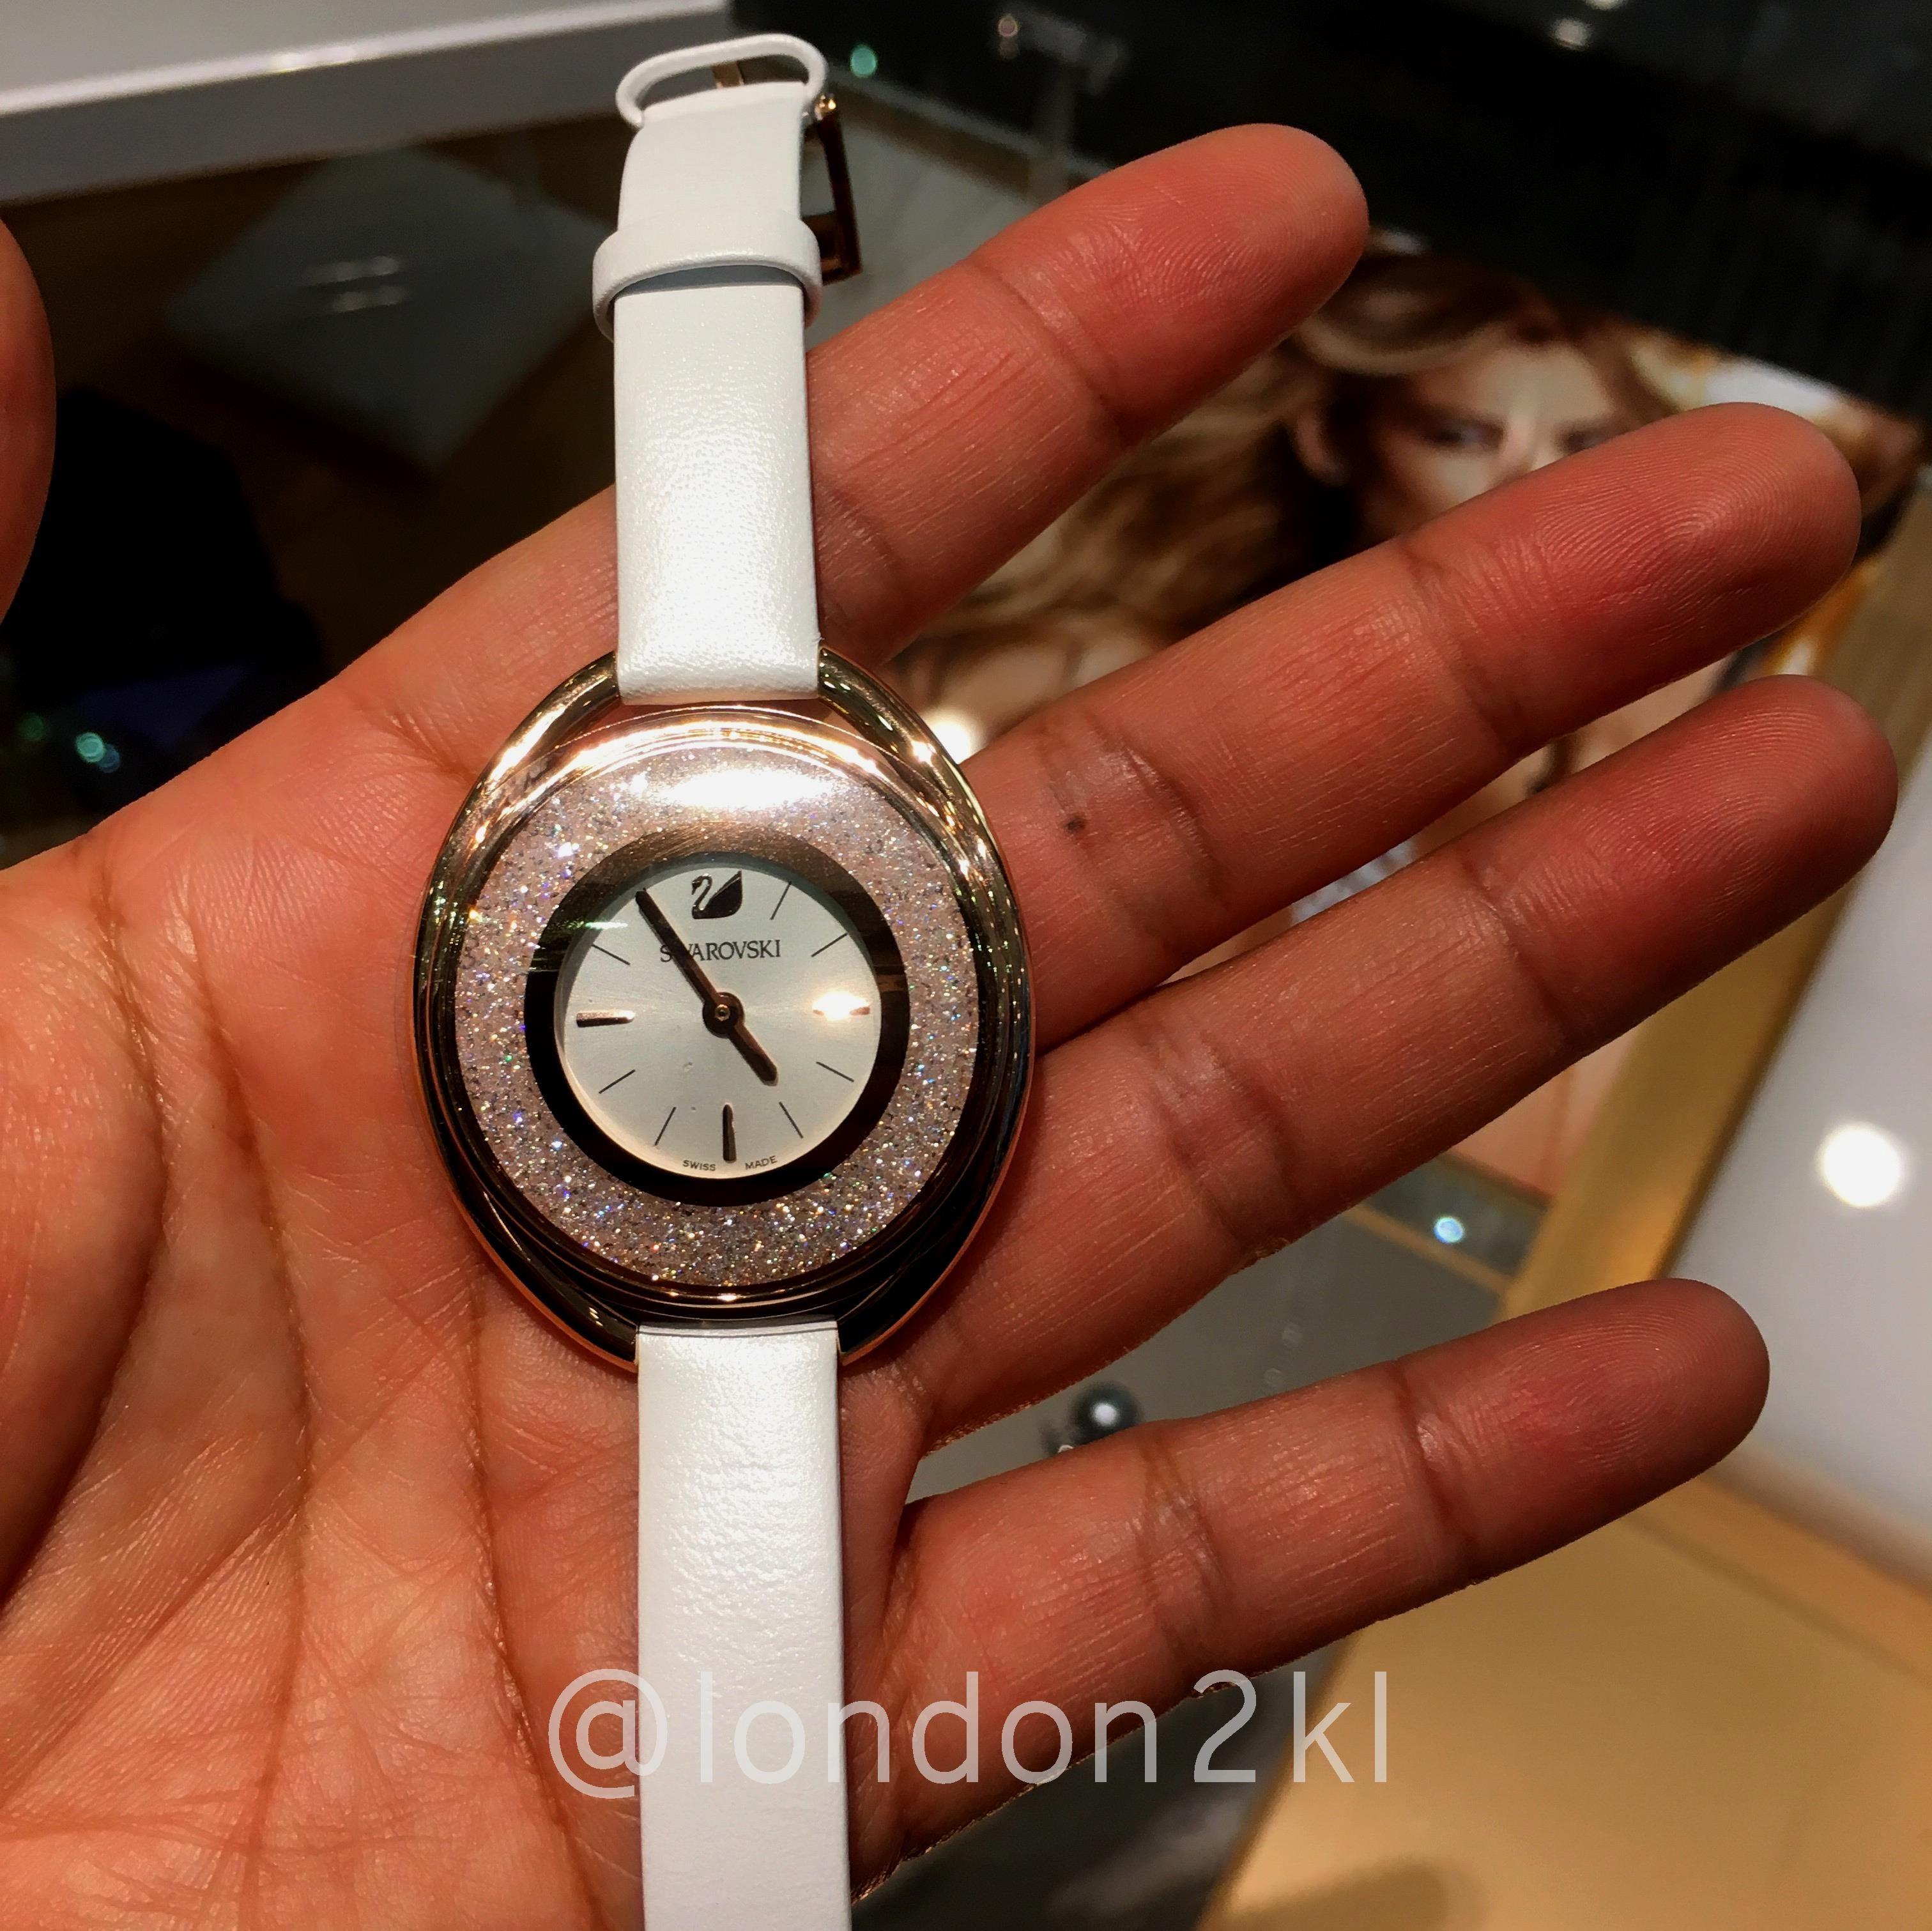 Swarovski Watch in White Strap RM1,450 ❤it? Reserve it before it's gone! WhatsApp us #L2KLSwarovski